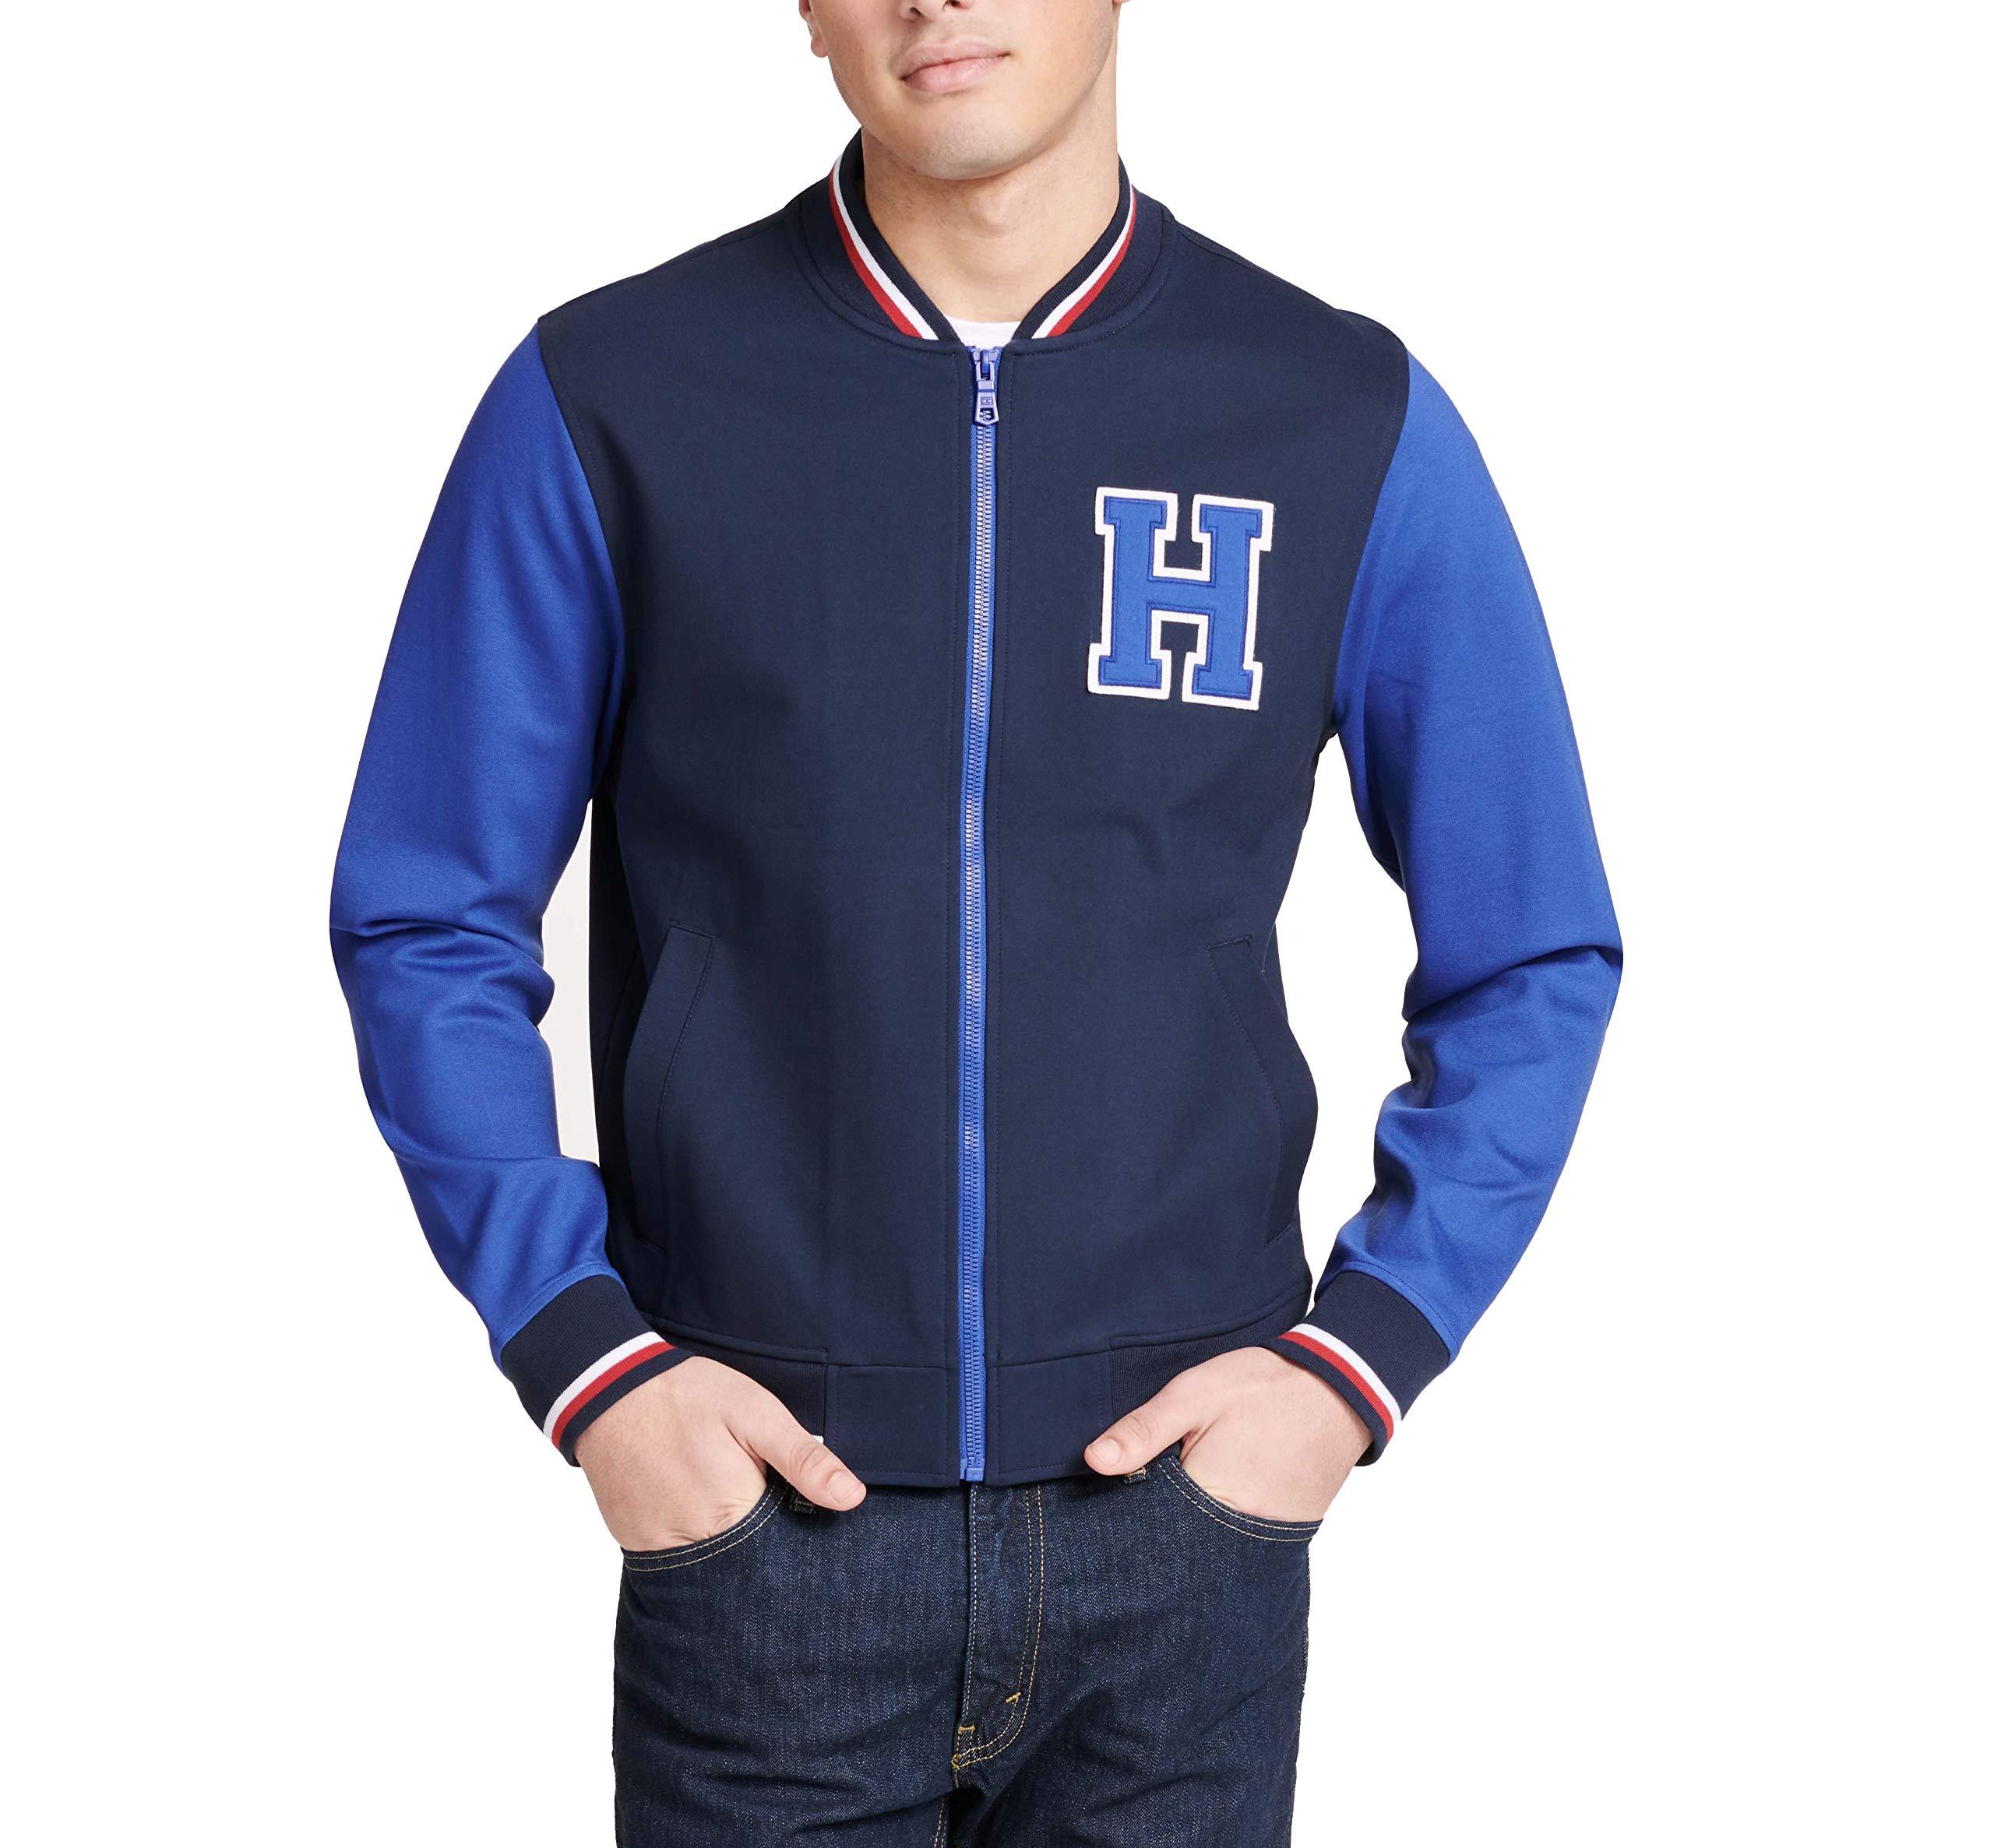 Tommy Hilfiger Men's Retro Varsity Bomber Colorblock Track Jacket, navy/royal blue, Large by Tommy Hilfiger